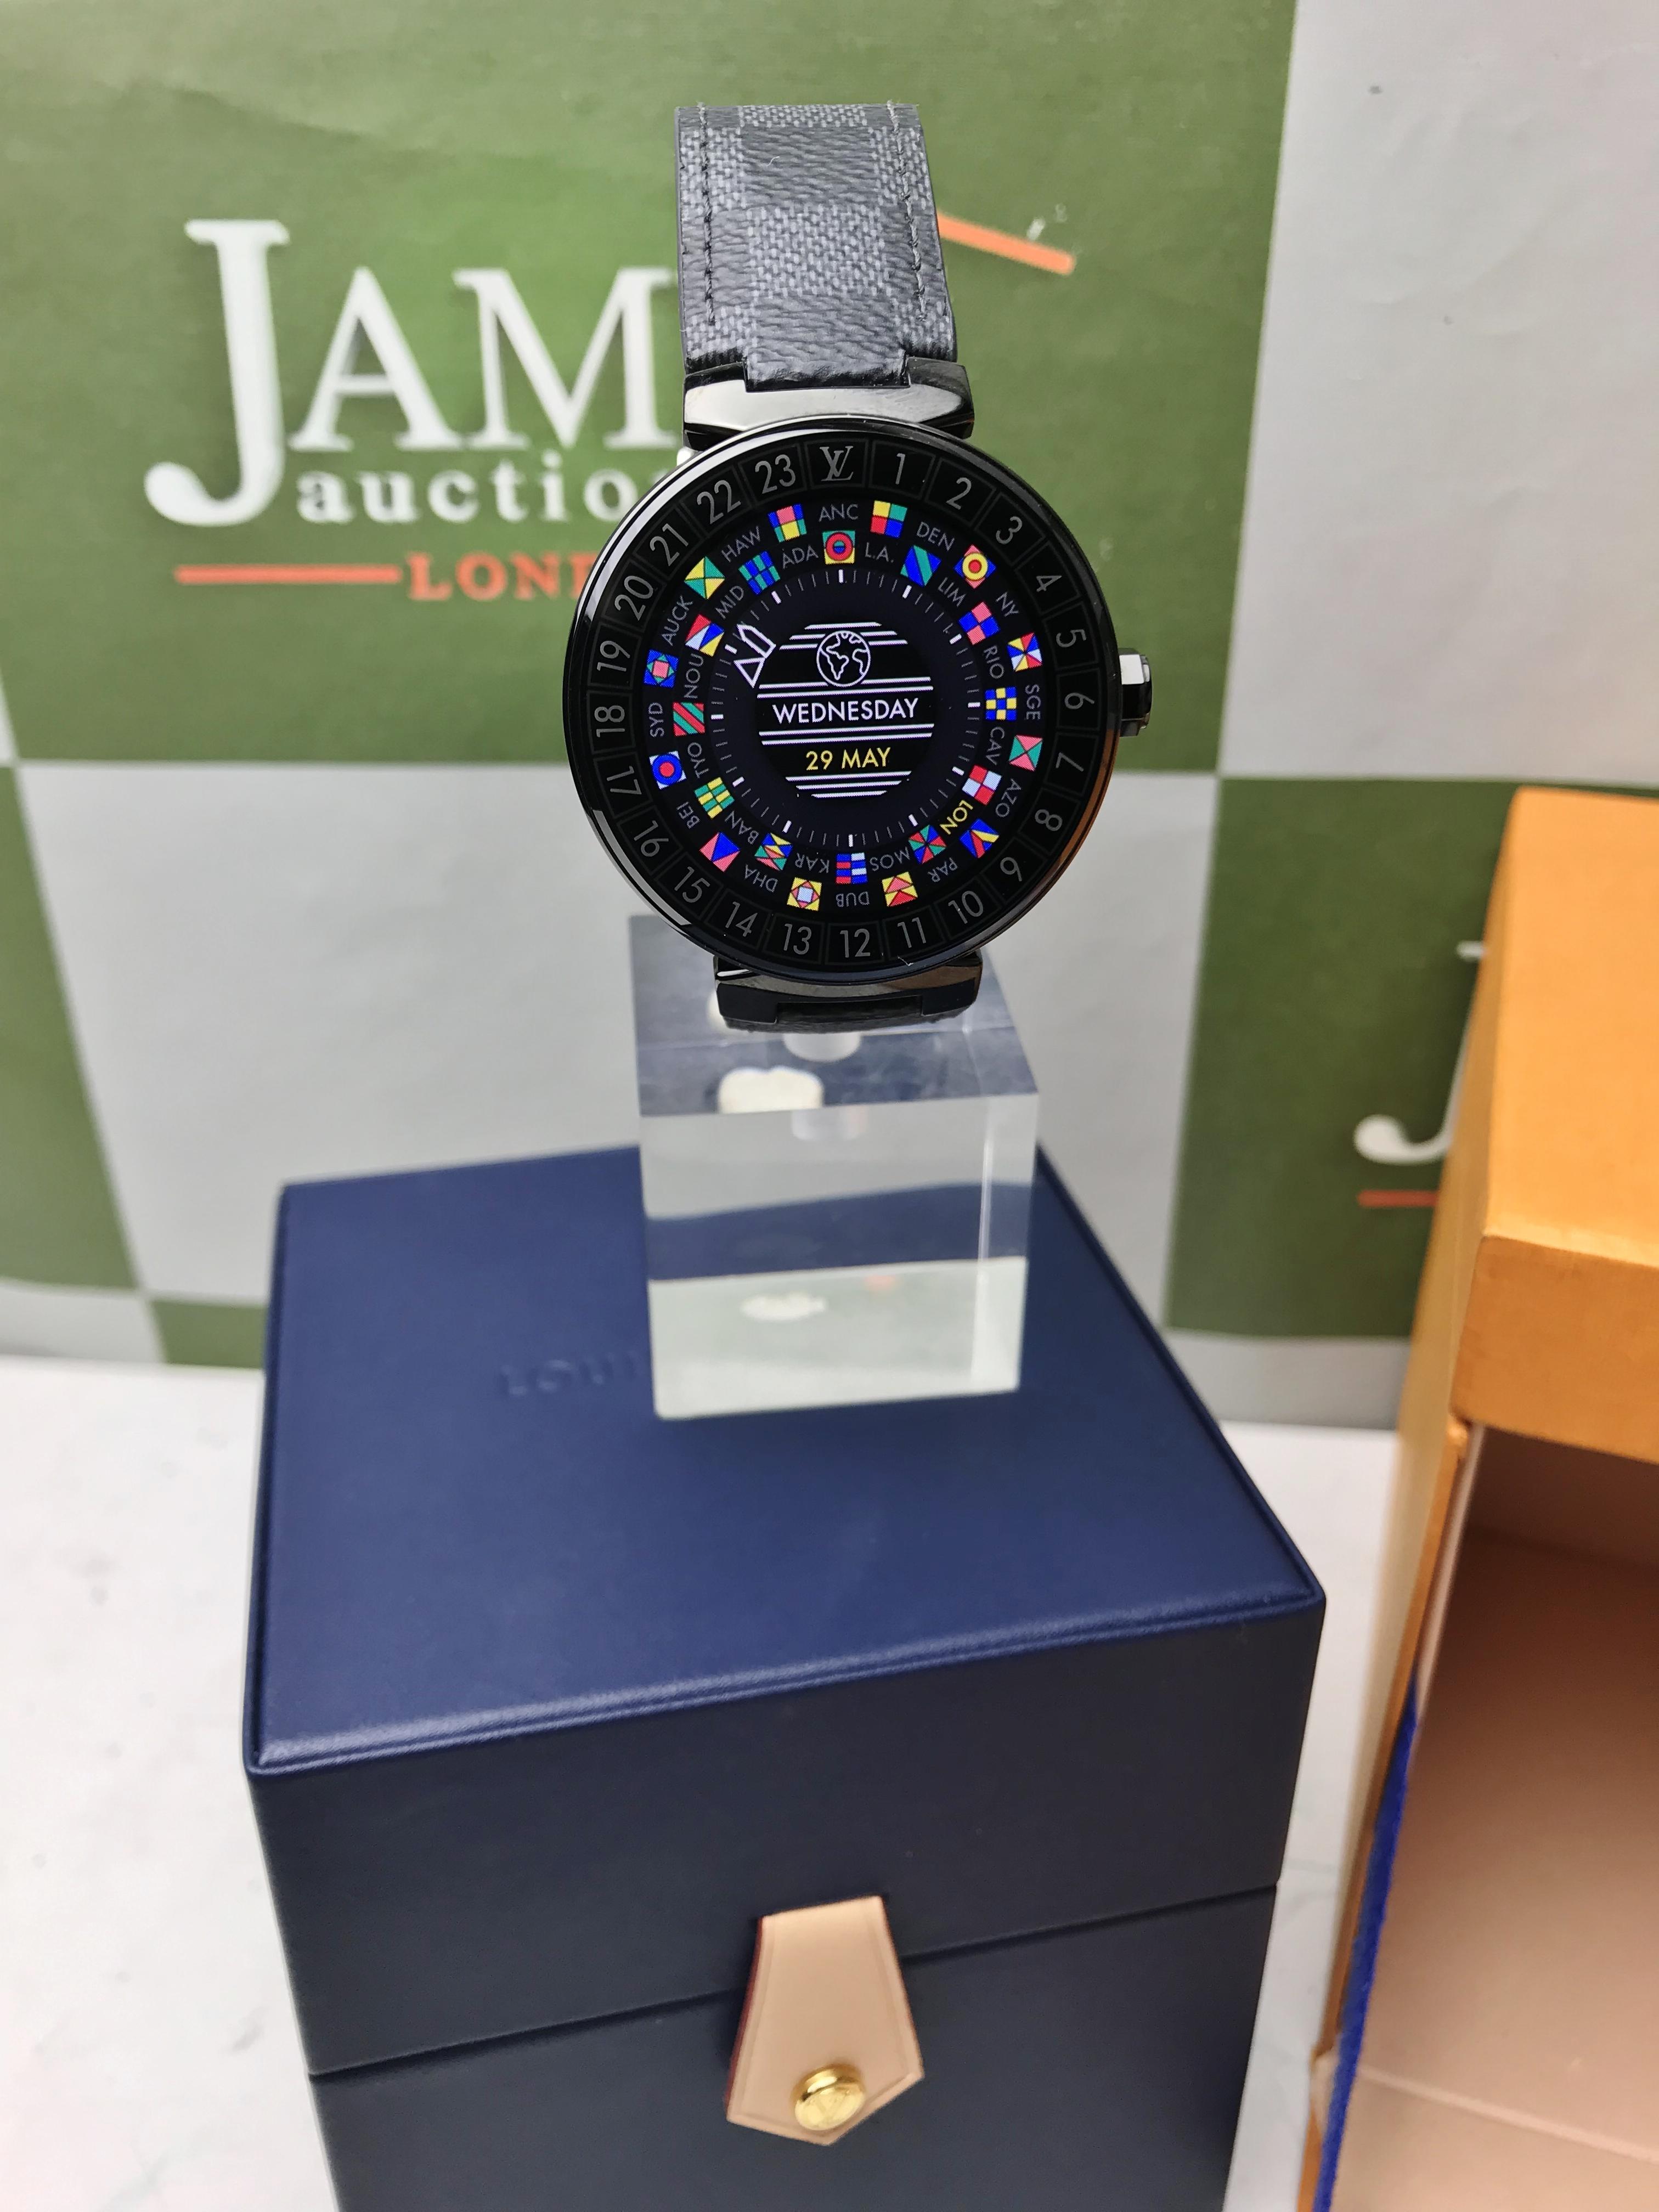 Lot 4 - Louis Vuitton Tambour Connected Smart Watch (QA002)